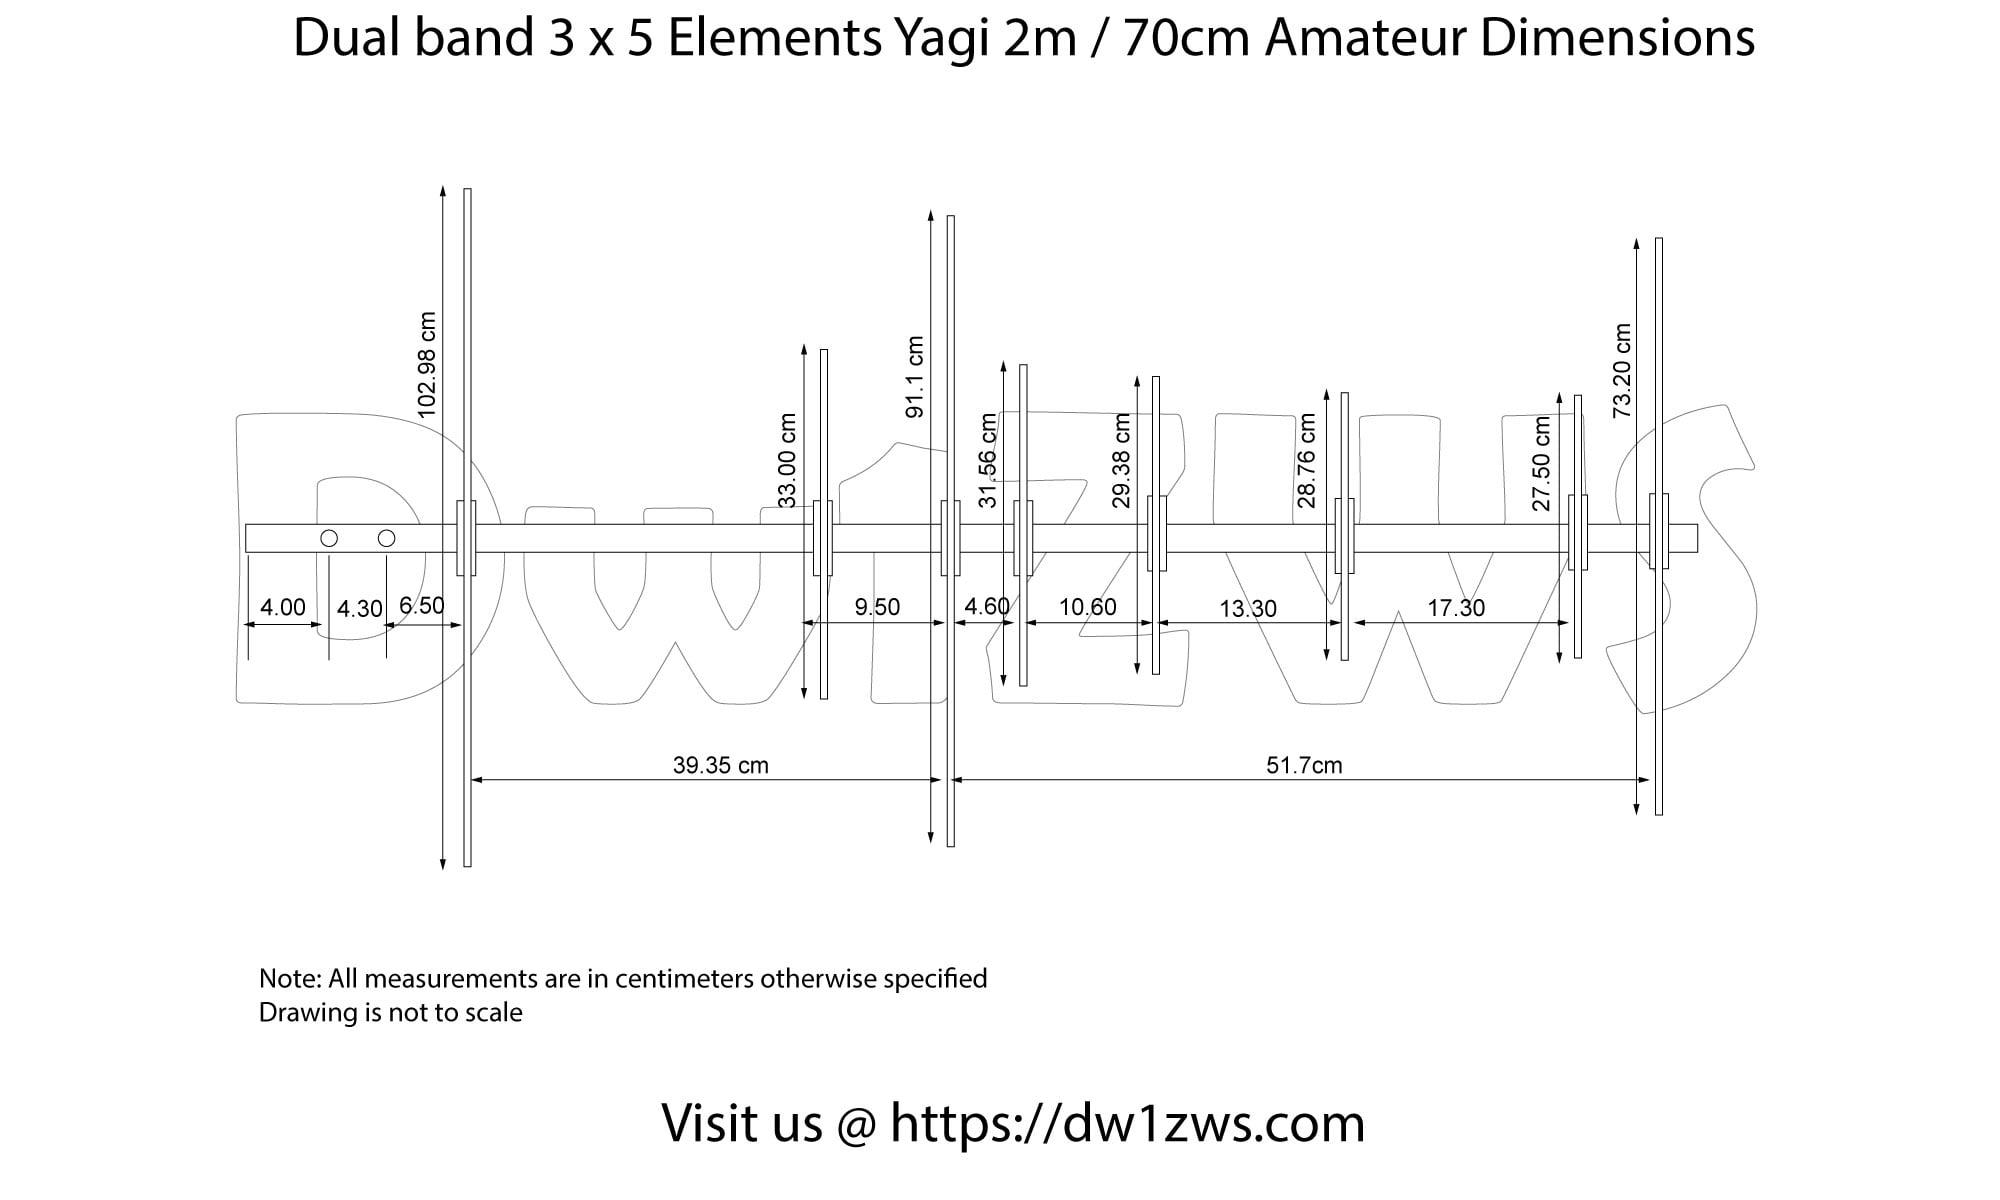 build the 3 x 5 elements 2m  70cm dualband yagi